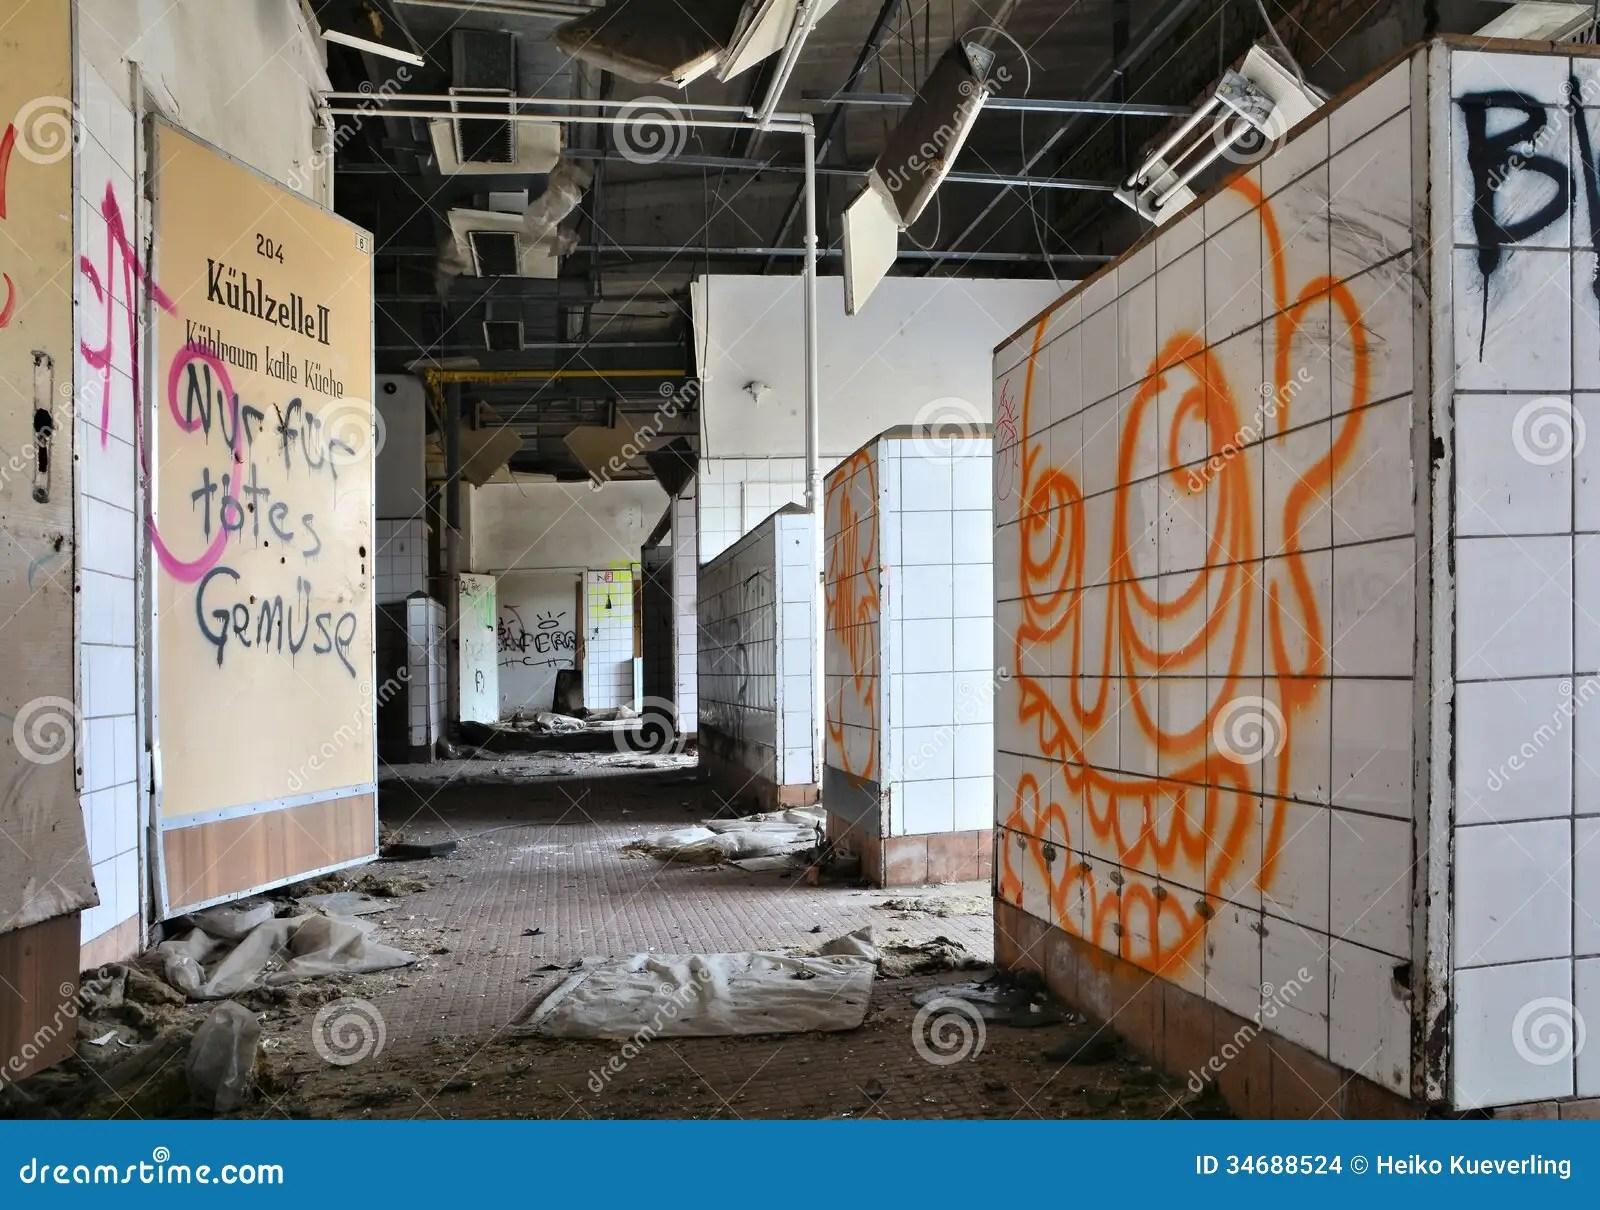 Kitchen In An Abandoned Restaurant Stock Photo  Image of danger glazed 34688524